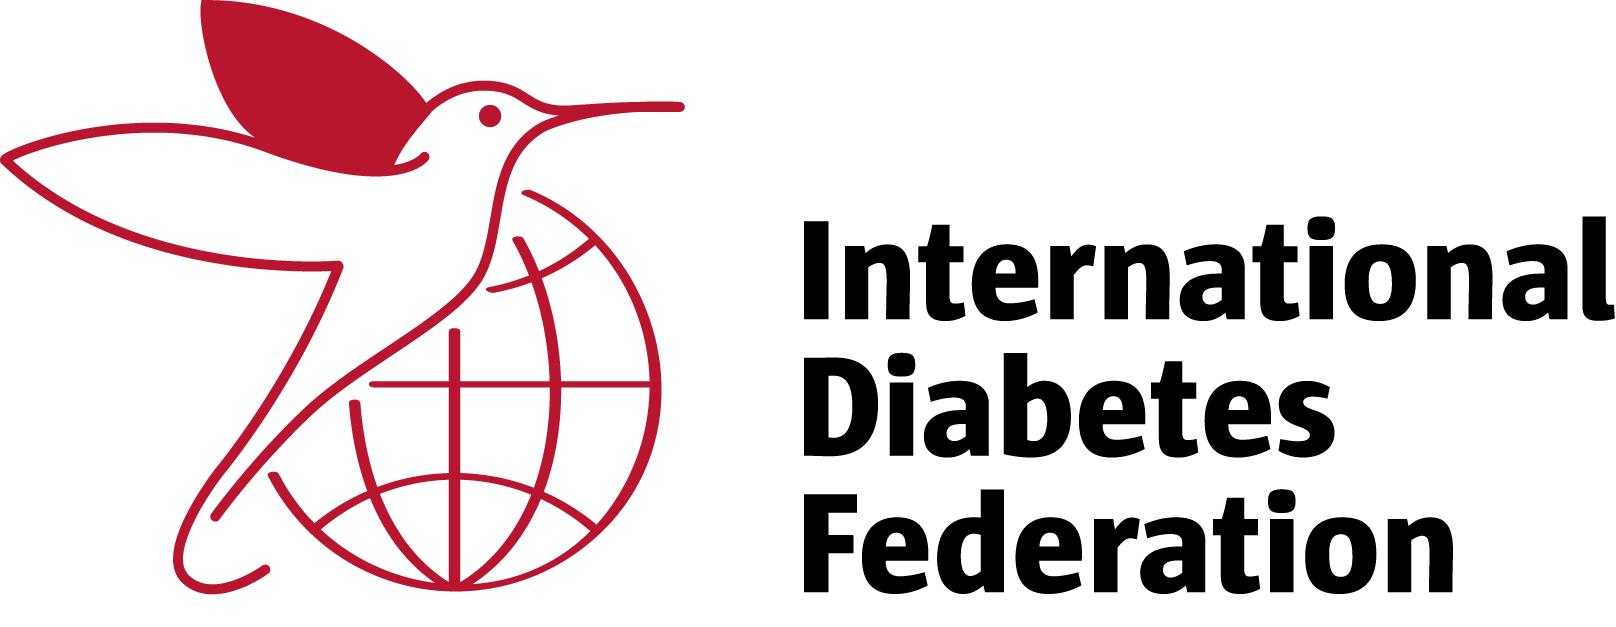 International diabetes federation